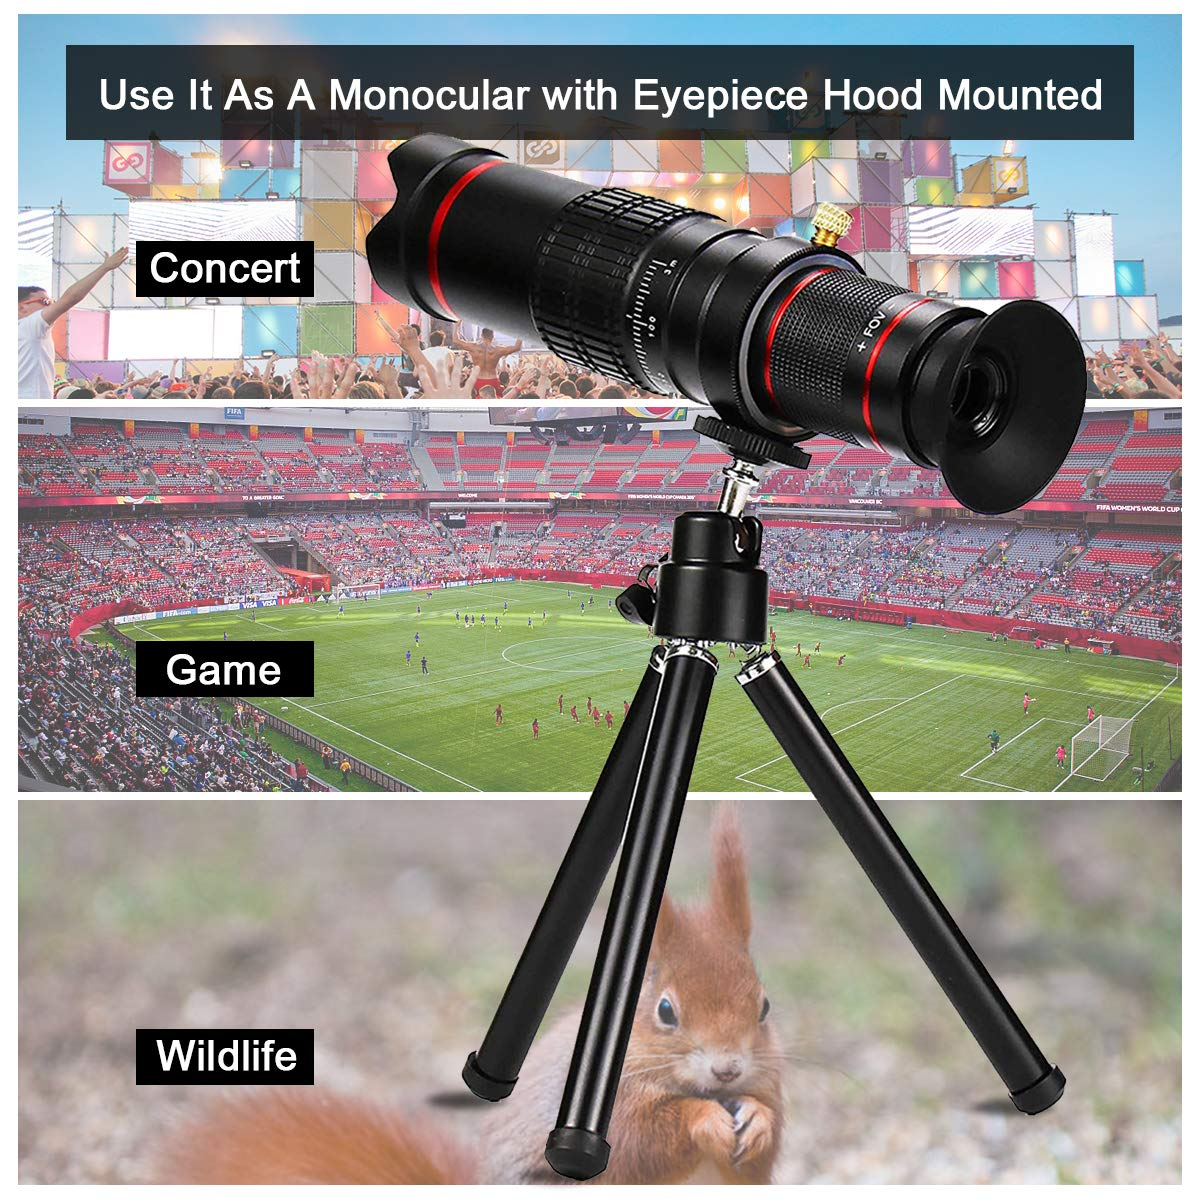 Cell Phone Camera Lens,Phone Photography Kit-Flexible Phone Tripod +Remote Shutter +4 in 1 Lens Kit-High Power 22X Monocular Telephoto Lens, Fisheye, Macro & Wide Angle Lens for Smartphone (Black) by Bamoer (Image #4)